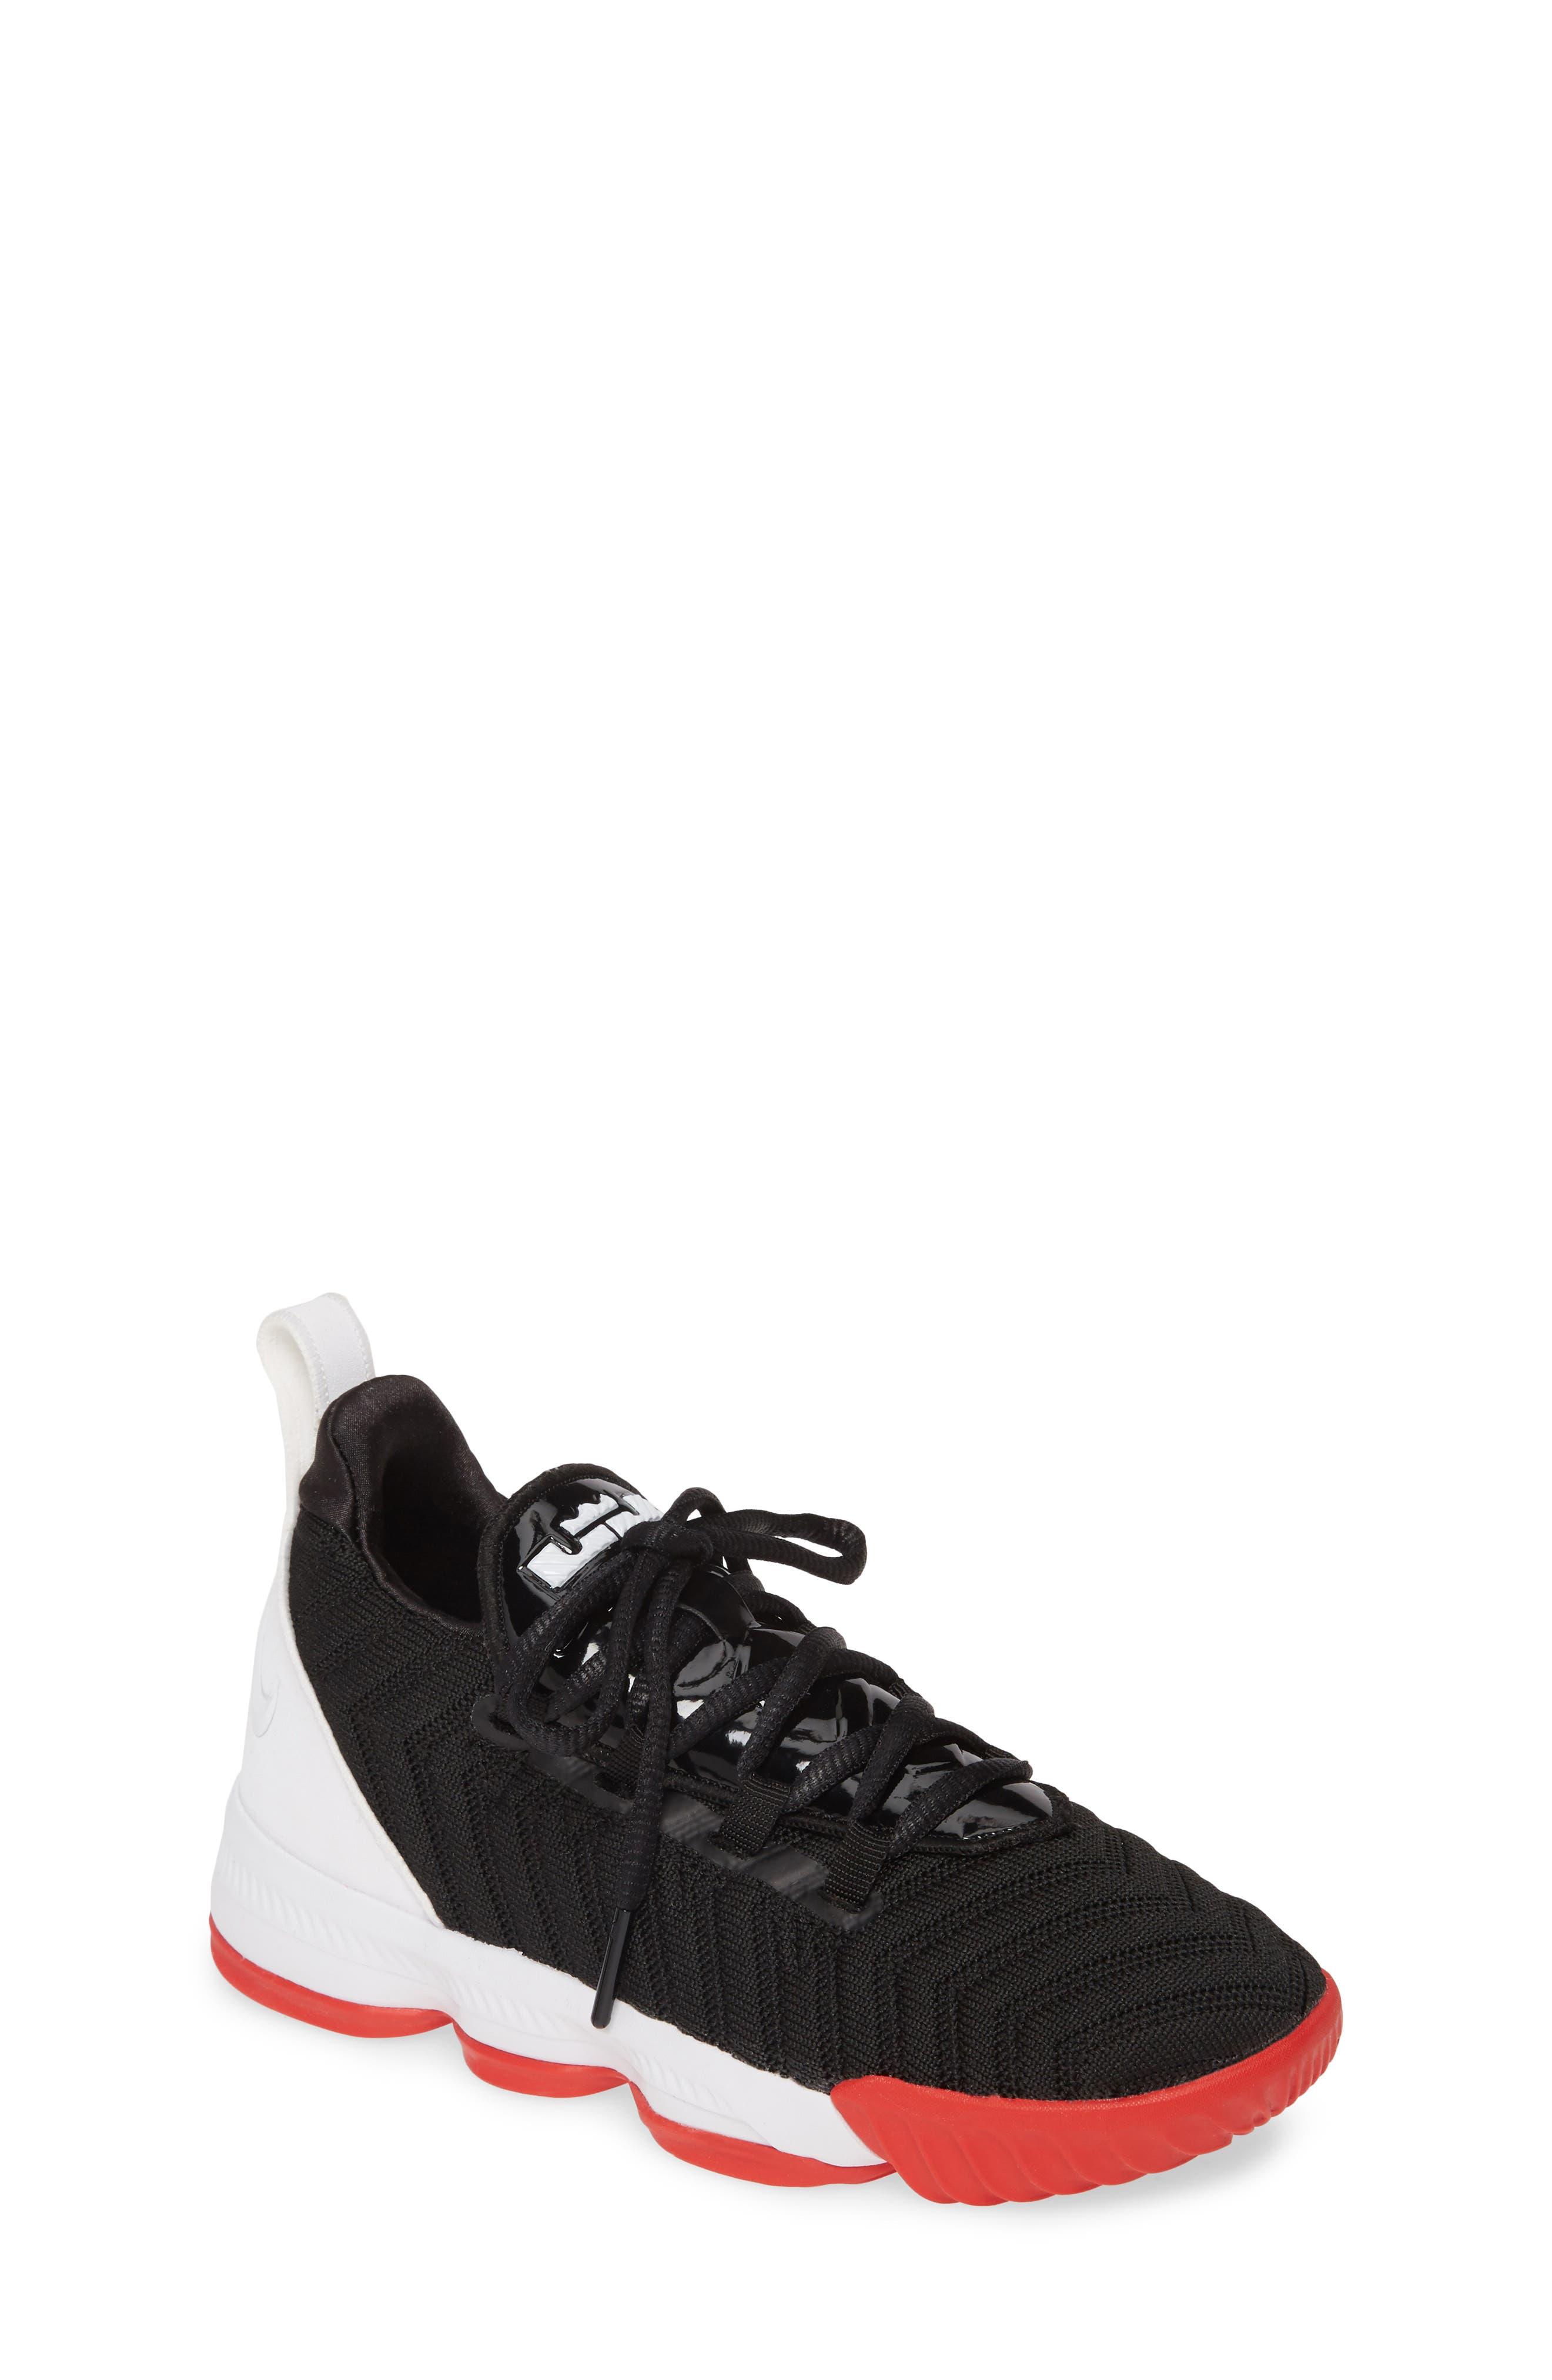 Toddler Nike Lebron Xvi Basketball Shoe Size 25 M  Black